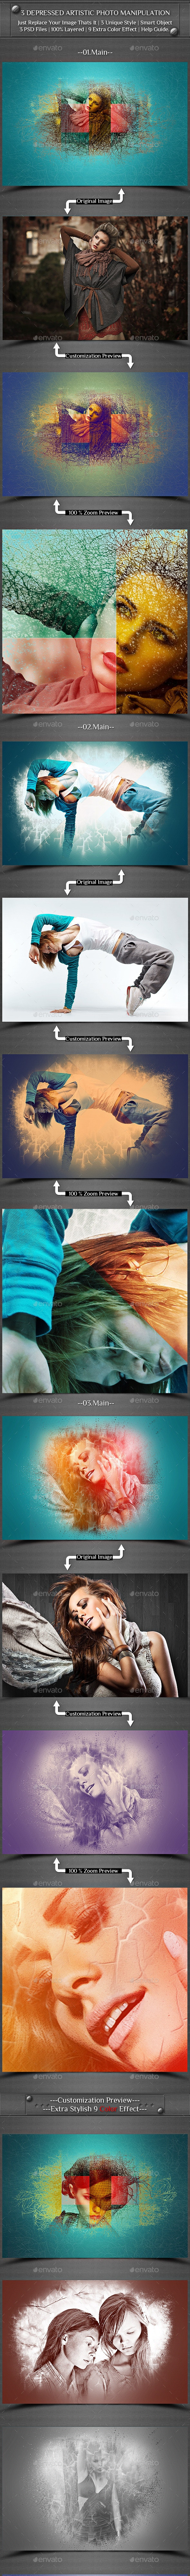 3 Depressed Artistic Photo Manipulation  - Photo Templates Graphics